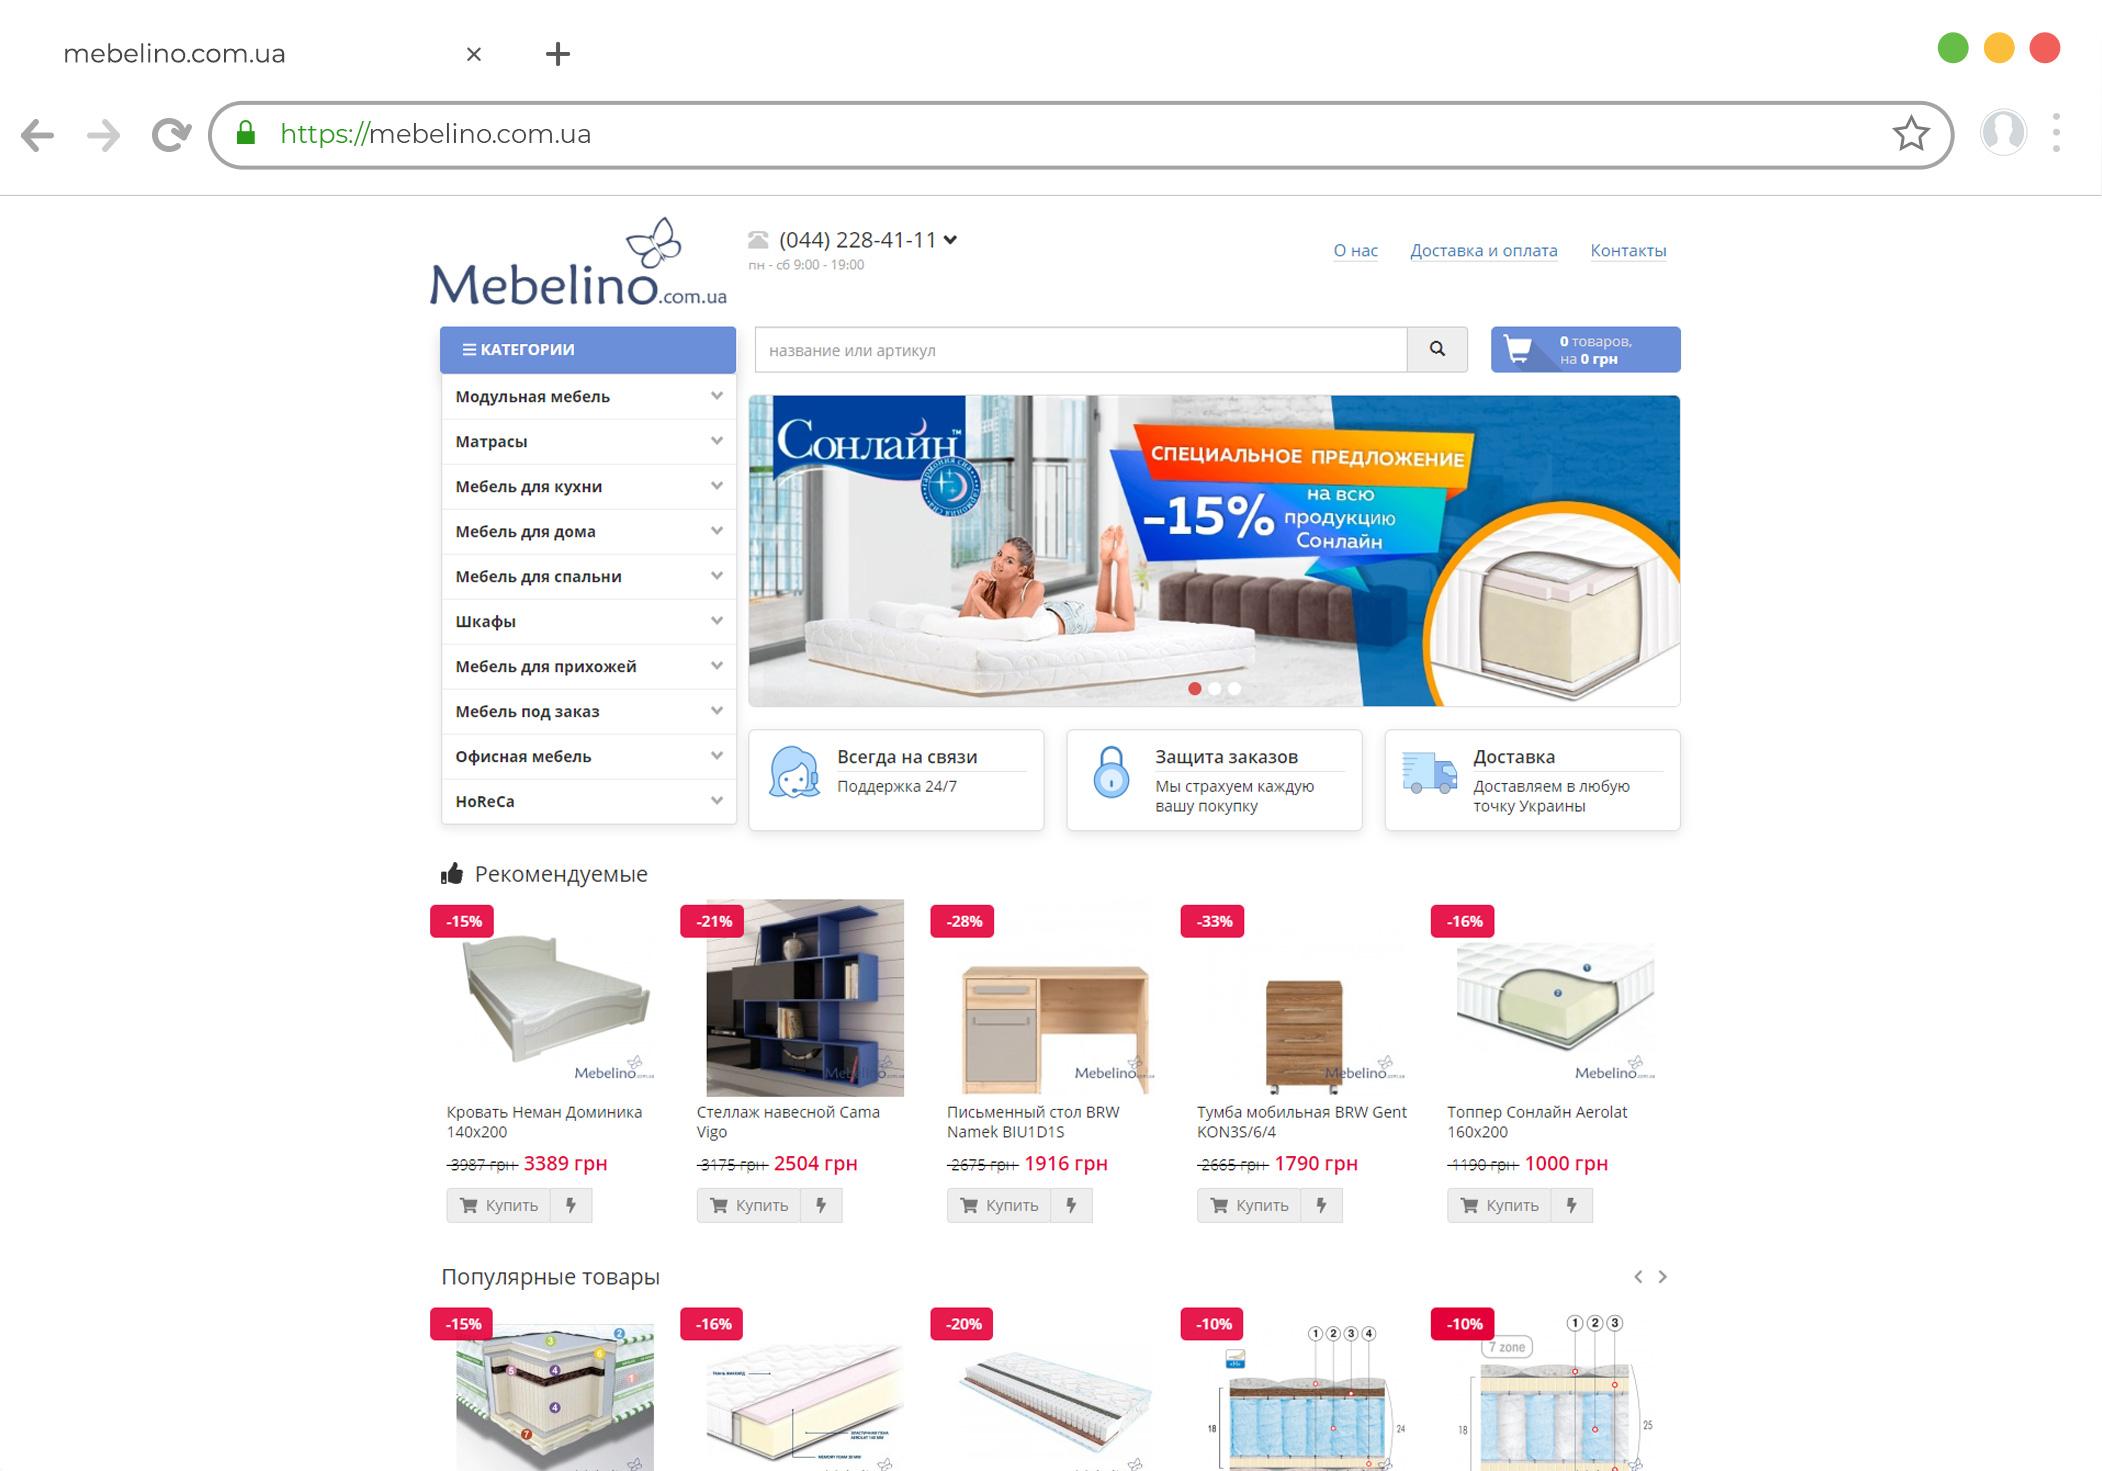 Разработка интернет магазина Mebelino на ЦМС Opencart 2 по изготовлению мебели на заказ